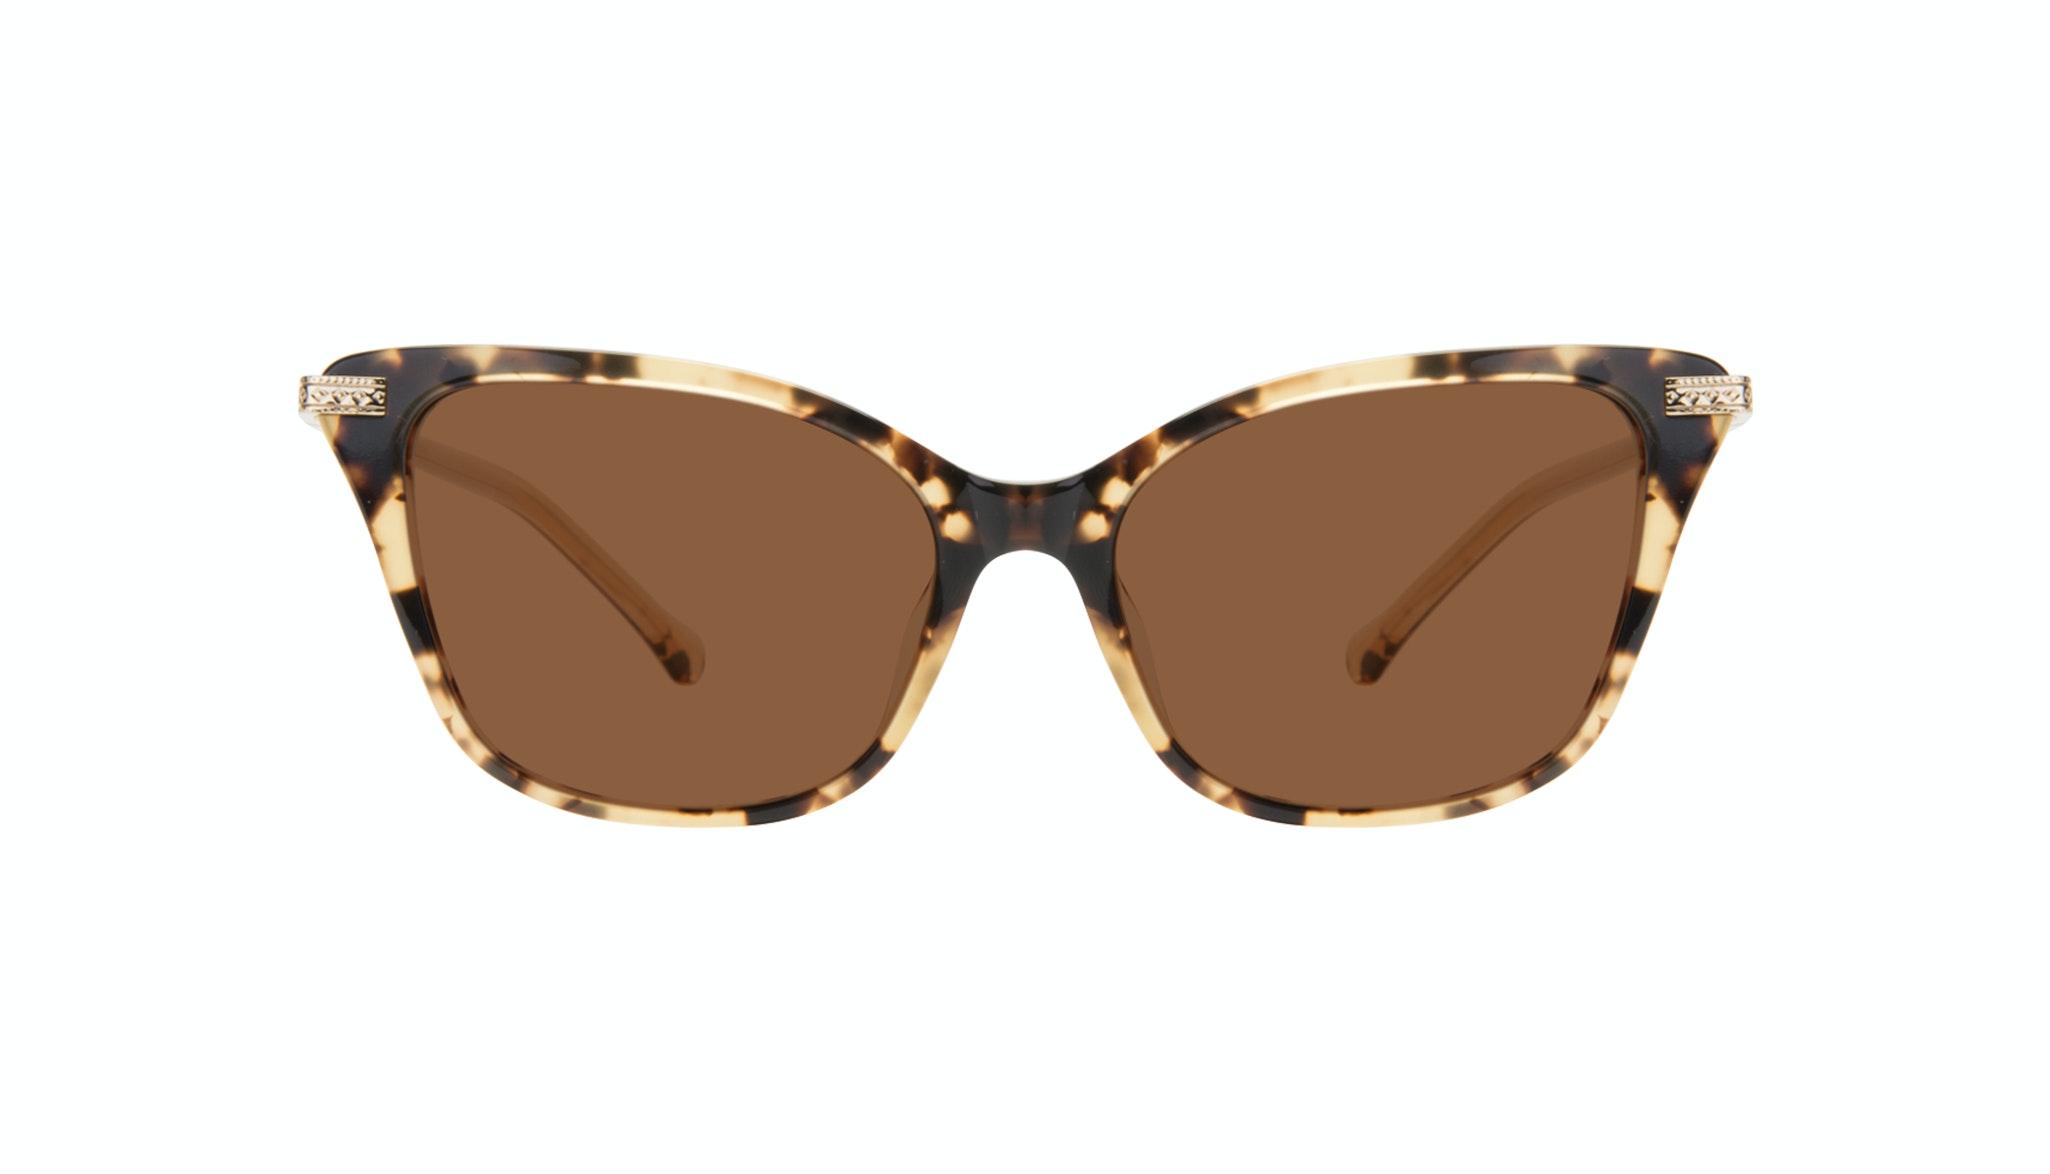 Affordable Fashion Glasses Cat Eye Sunglasses Women Stargaze Golden Chip Front